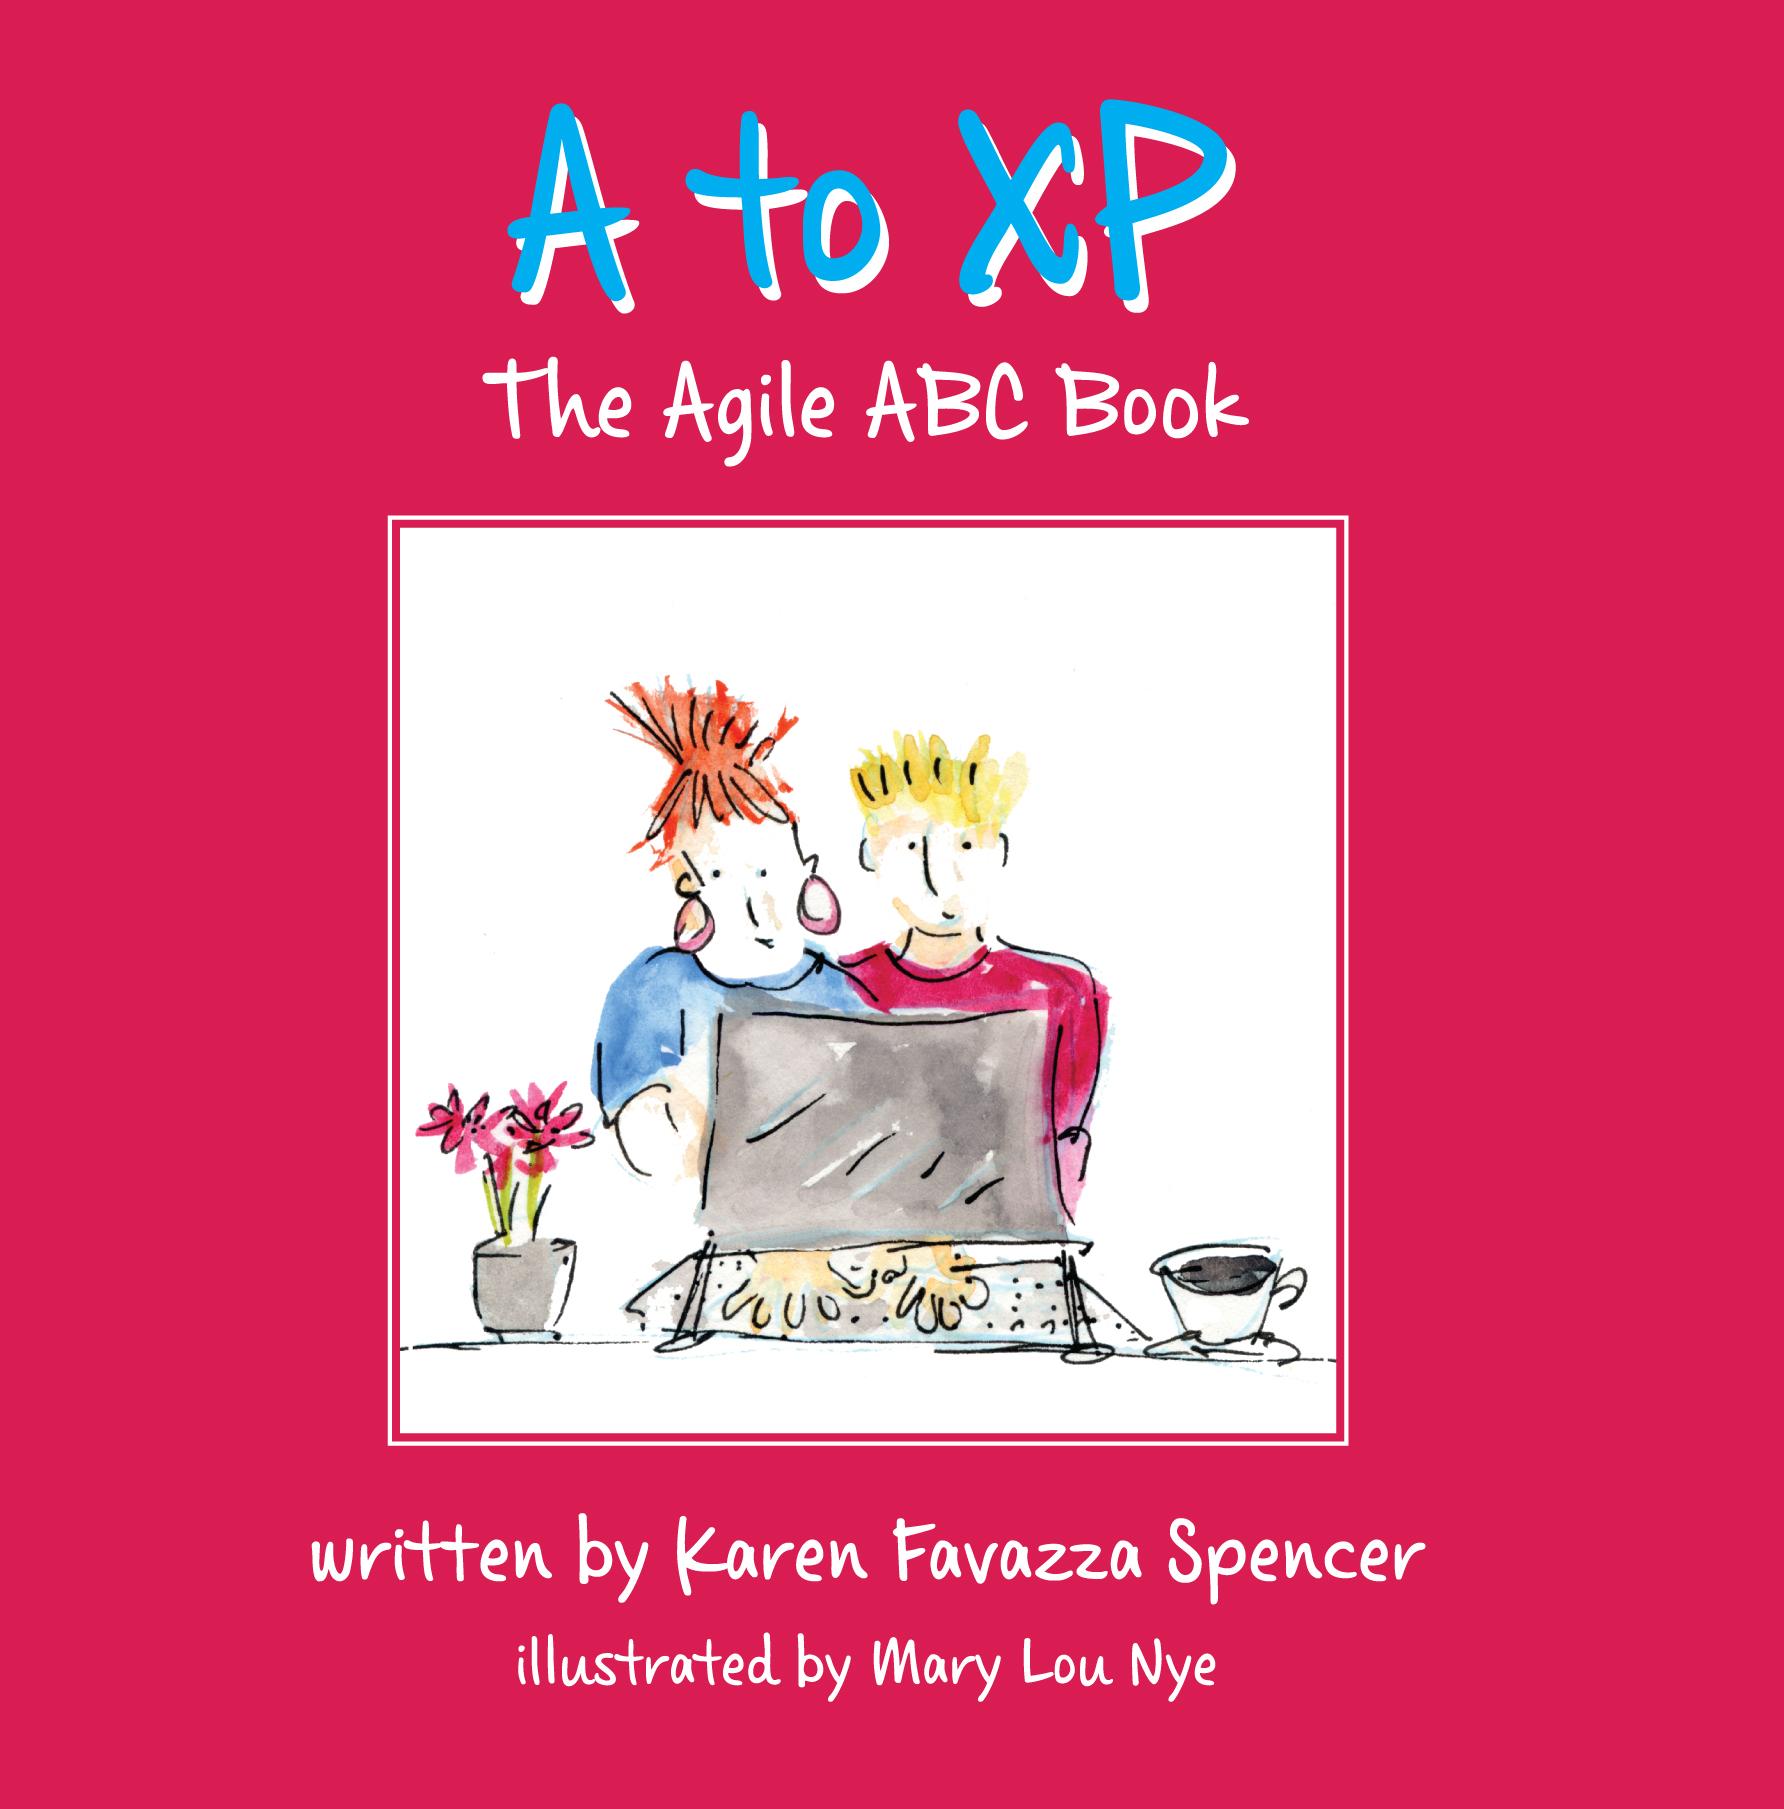 A to XP: The Agile ABC Book